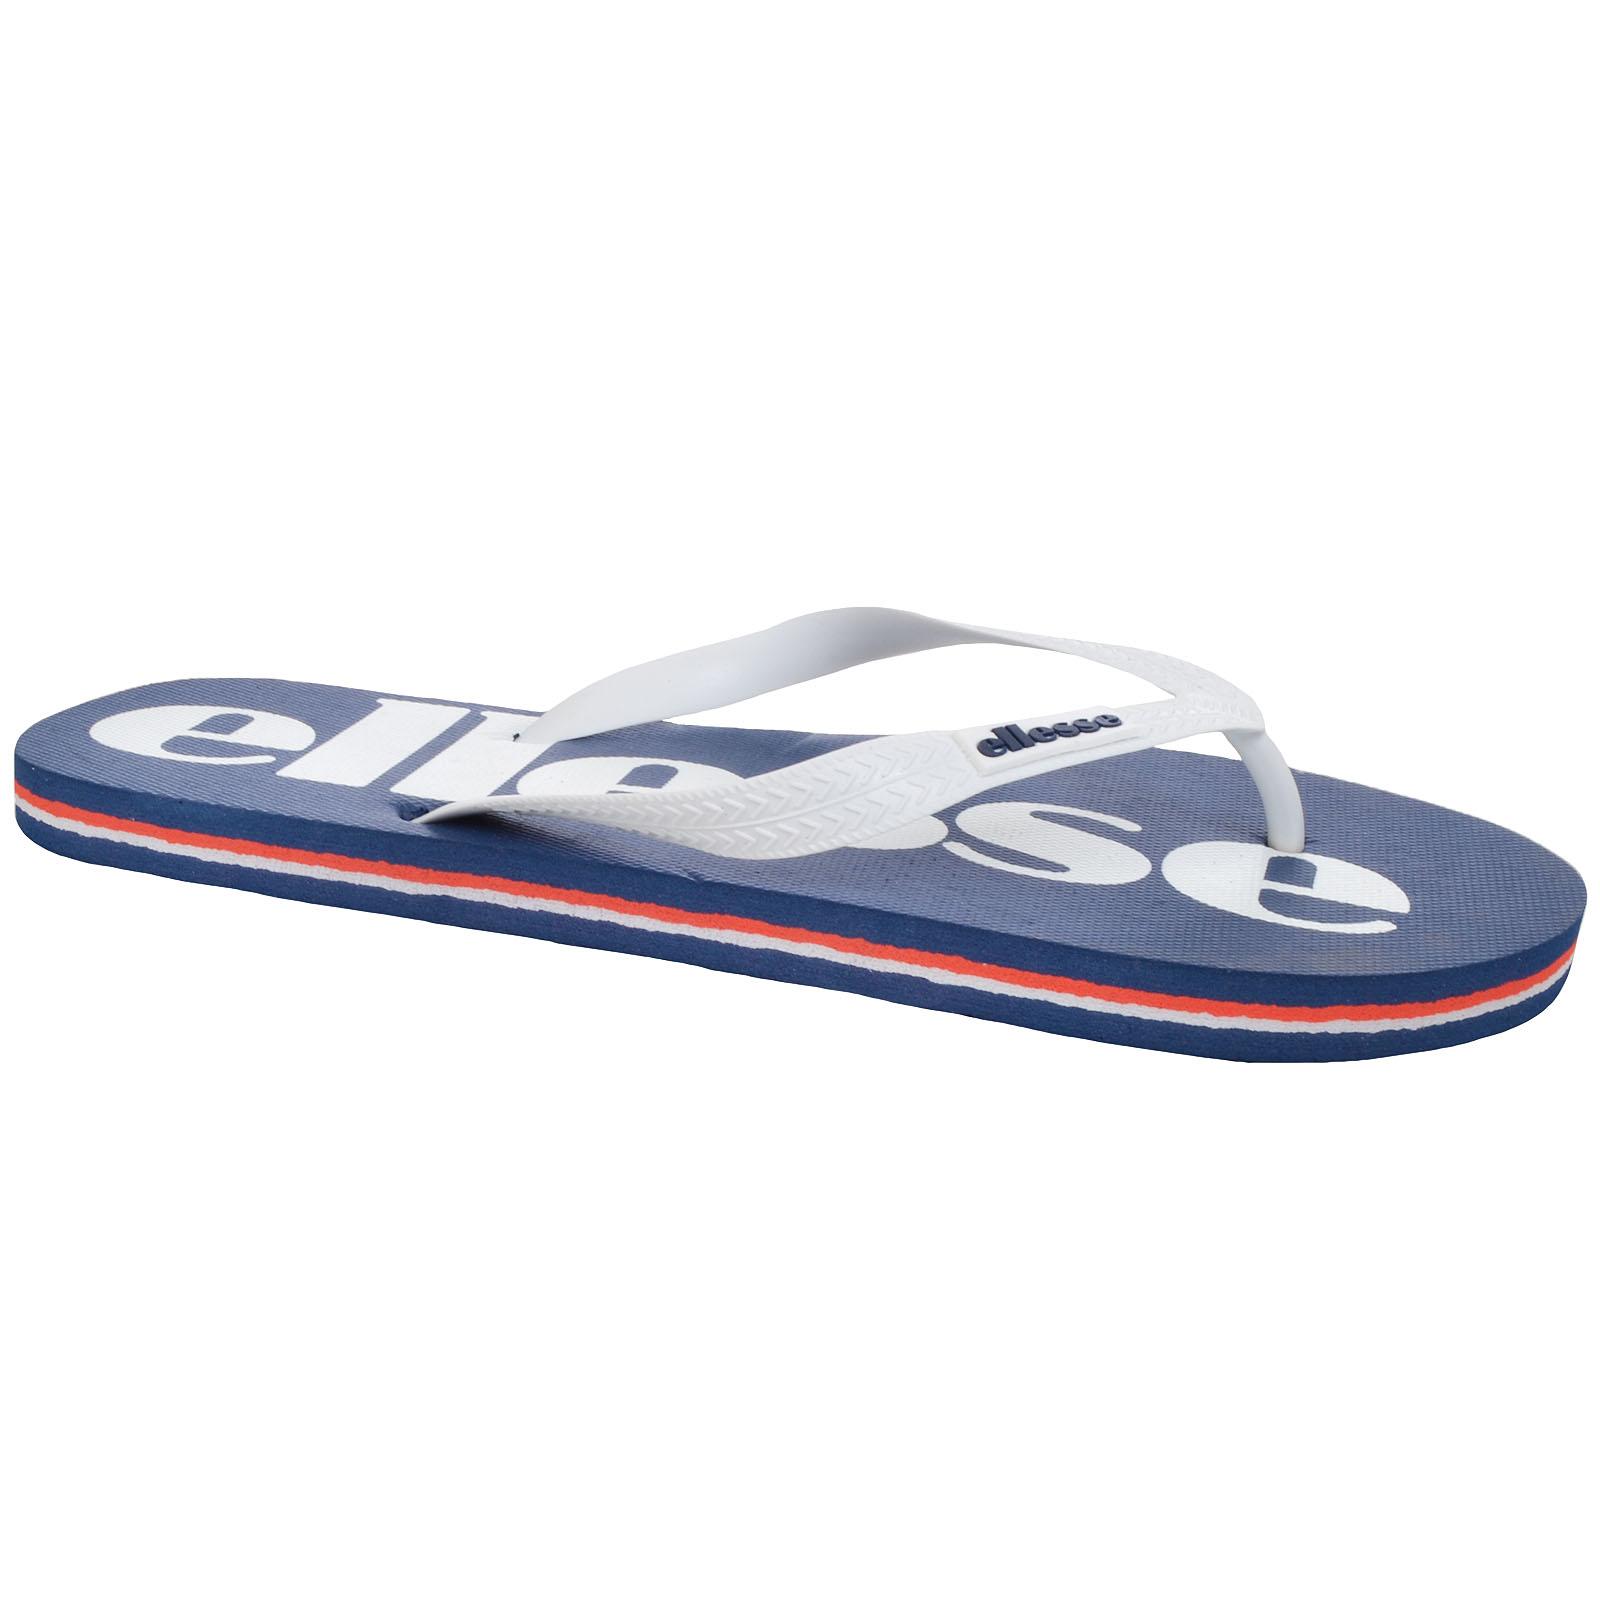 Ellesse-Mens-Marcos-Flip-Flops-Beach-Pool-Holiday-Slip-On-Sandals-Thongs thumbnail 15